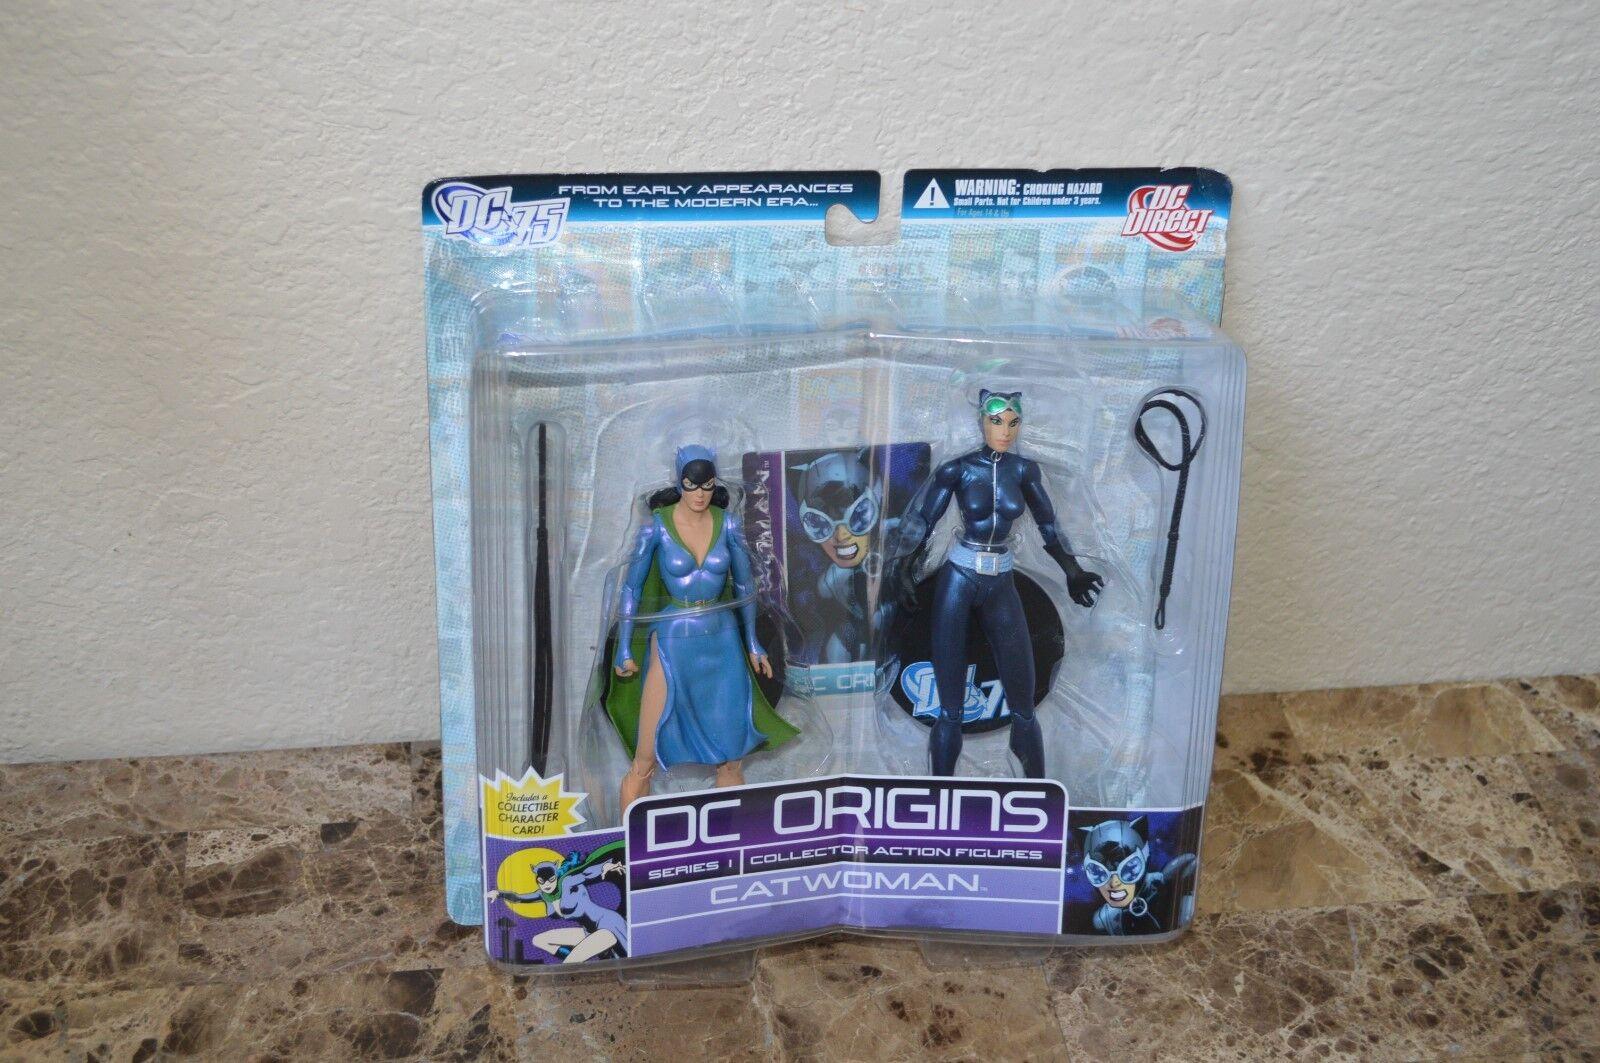 DC Origins serie 1 CATHMAN 6i åtgärd Figur 2 pK DC Direkt leksaker